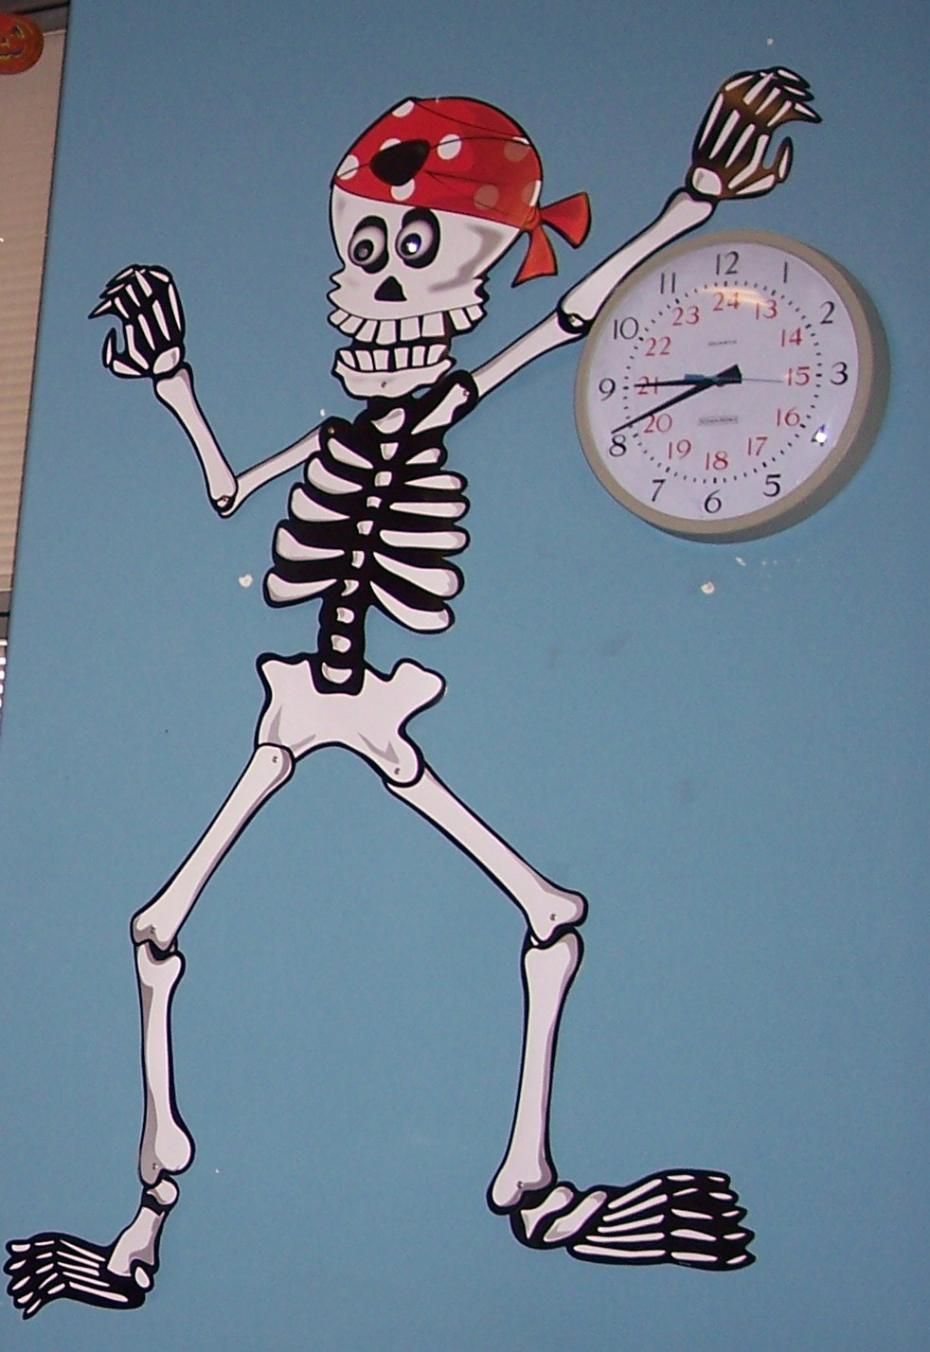 schelet masurand timpul